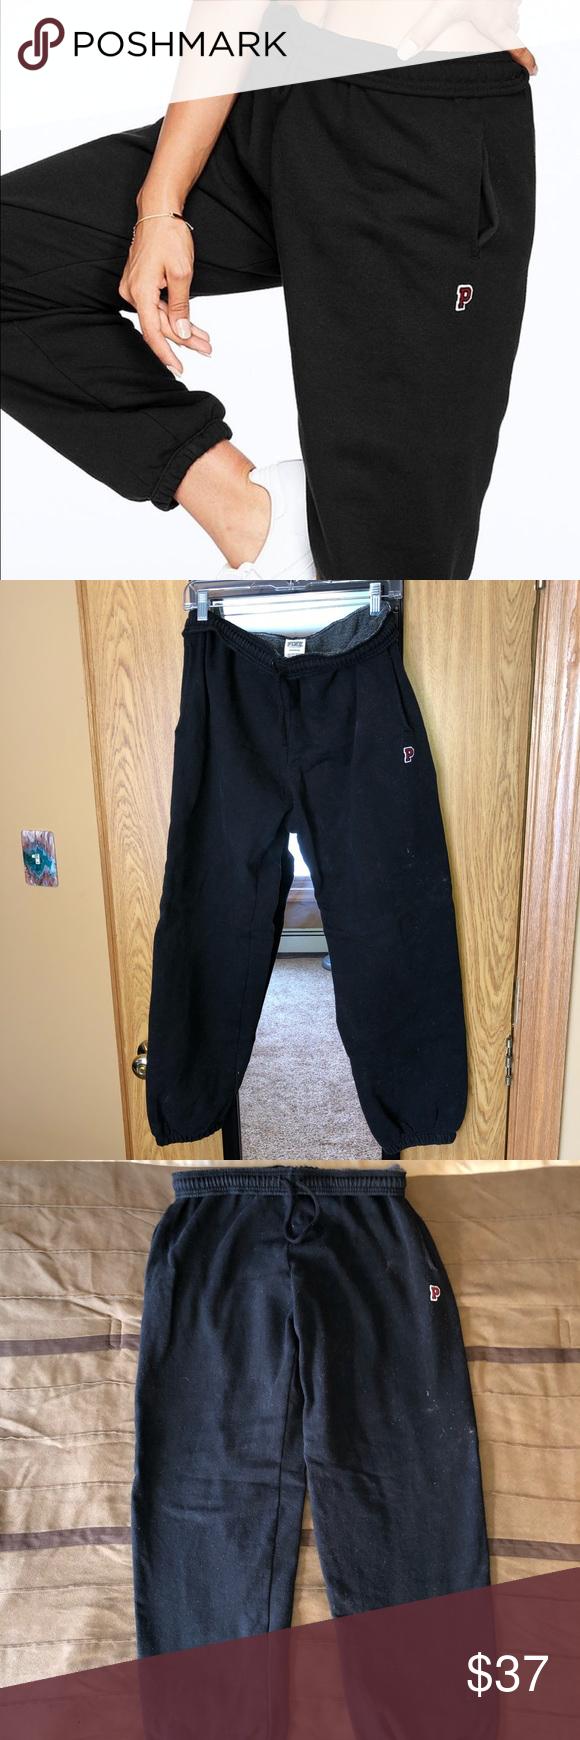 70c2b314a3b PREMIUM COLLEGE CAMPUS PANT VS Pink black super soft and cozy sweatpants.  They